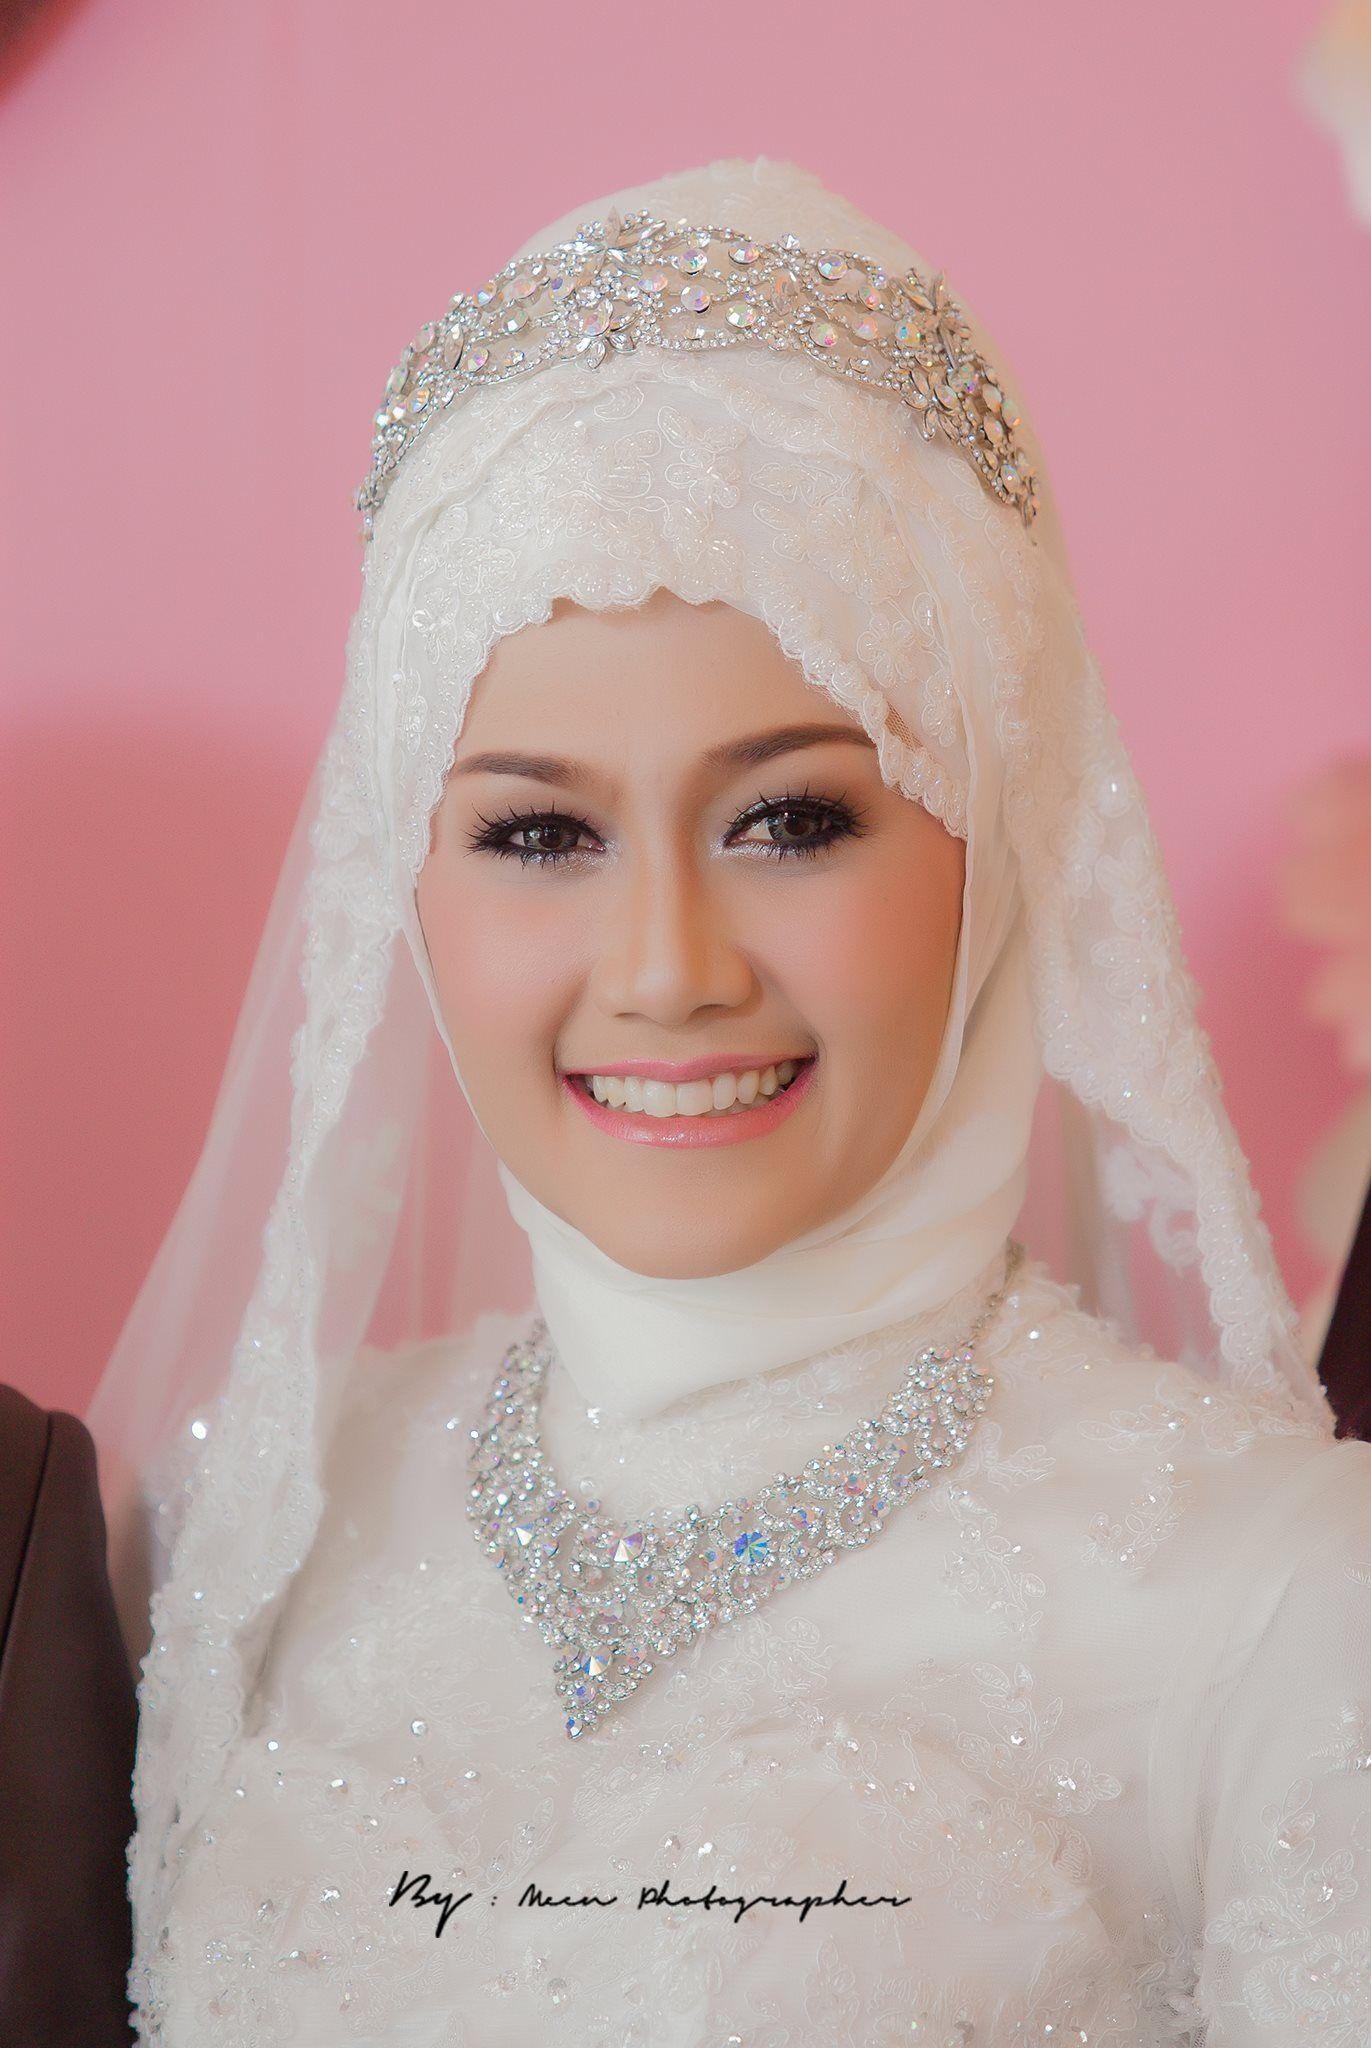 Wedding | Formal Dress | Pinterest | Vestidos de novia, De novia y ...